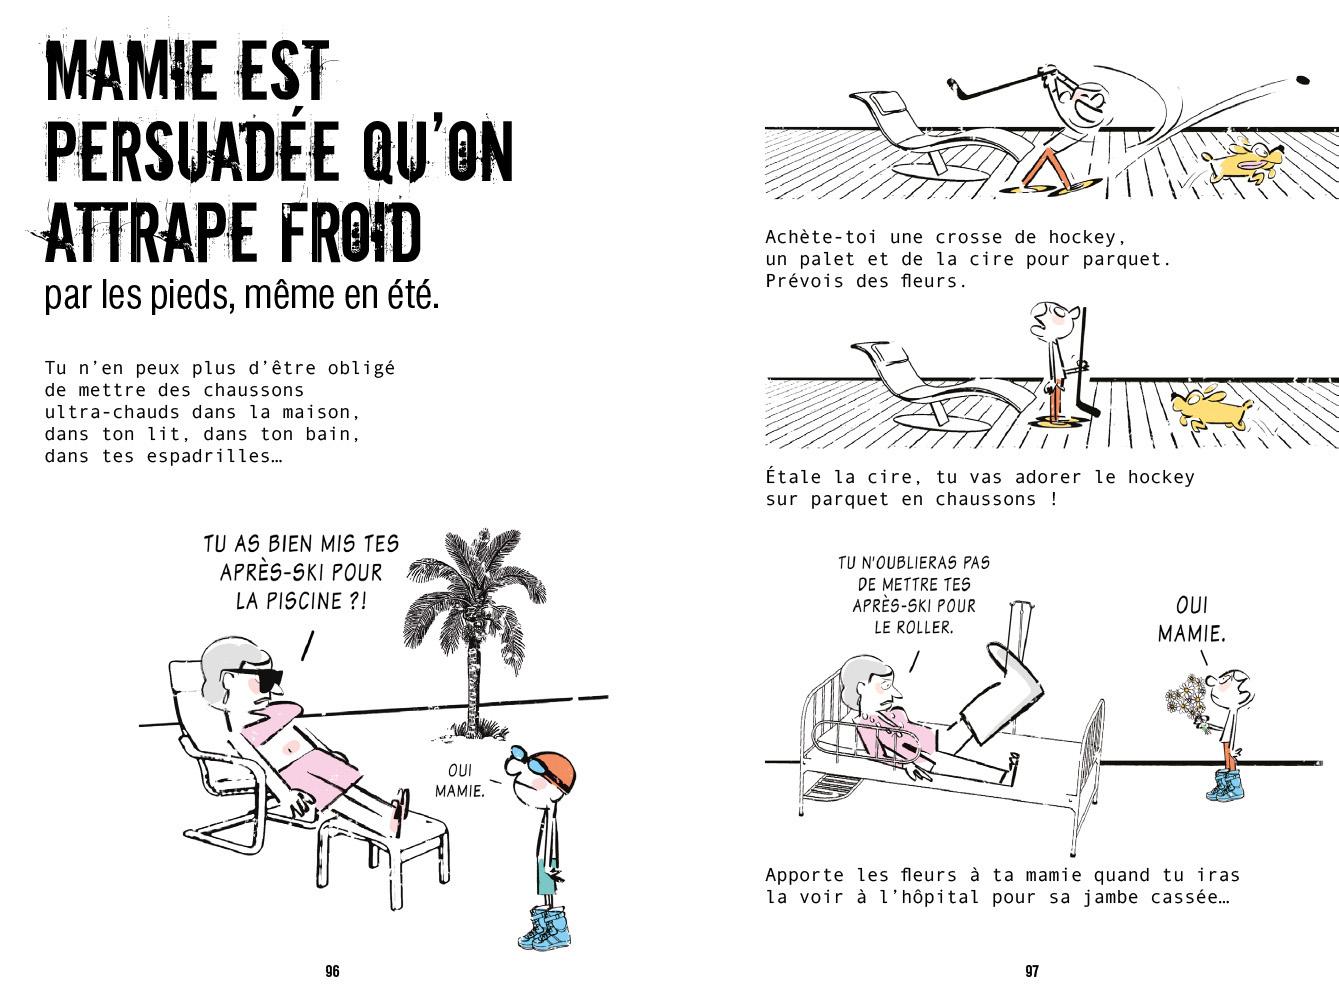 GUIDE DE SURVIE EN MILIEU HOSTILE Laurence Salaün / Gilles